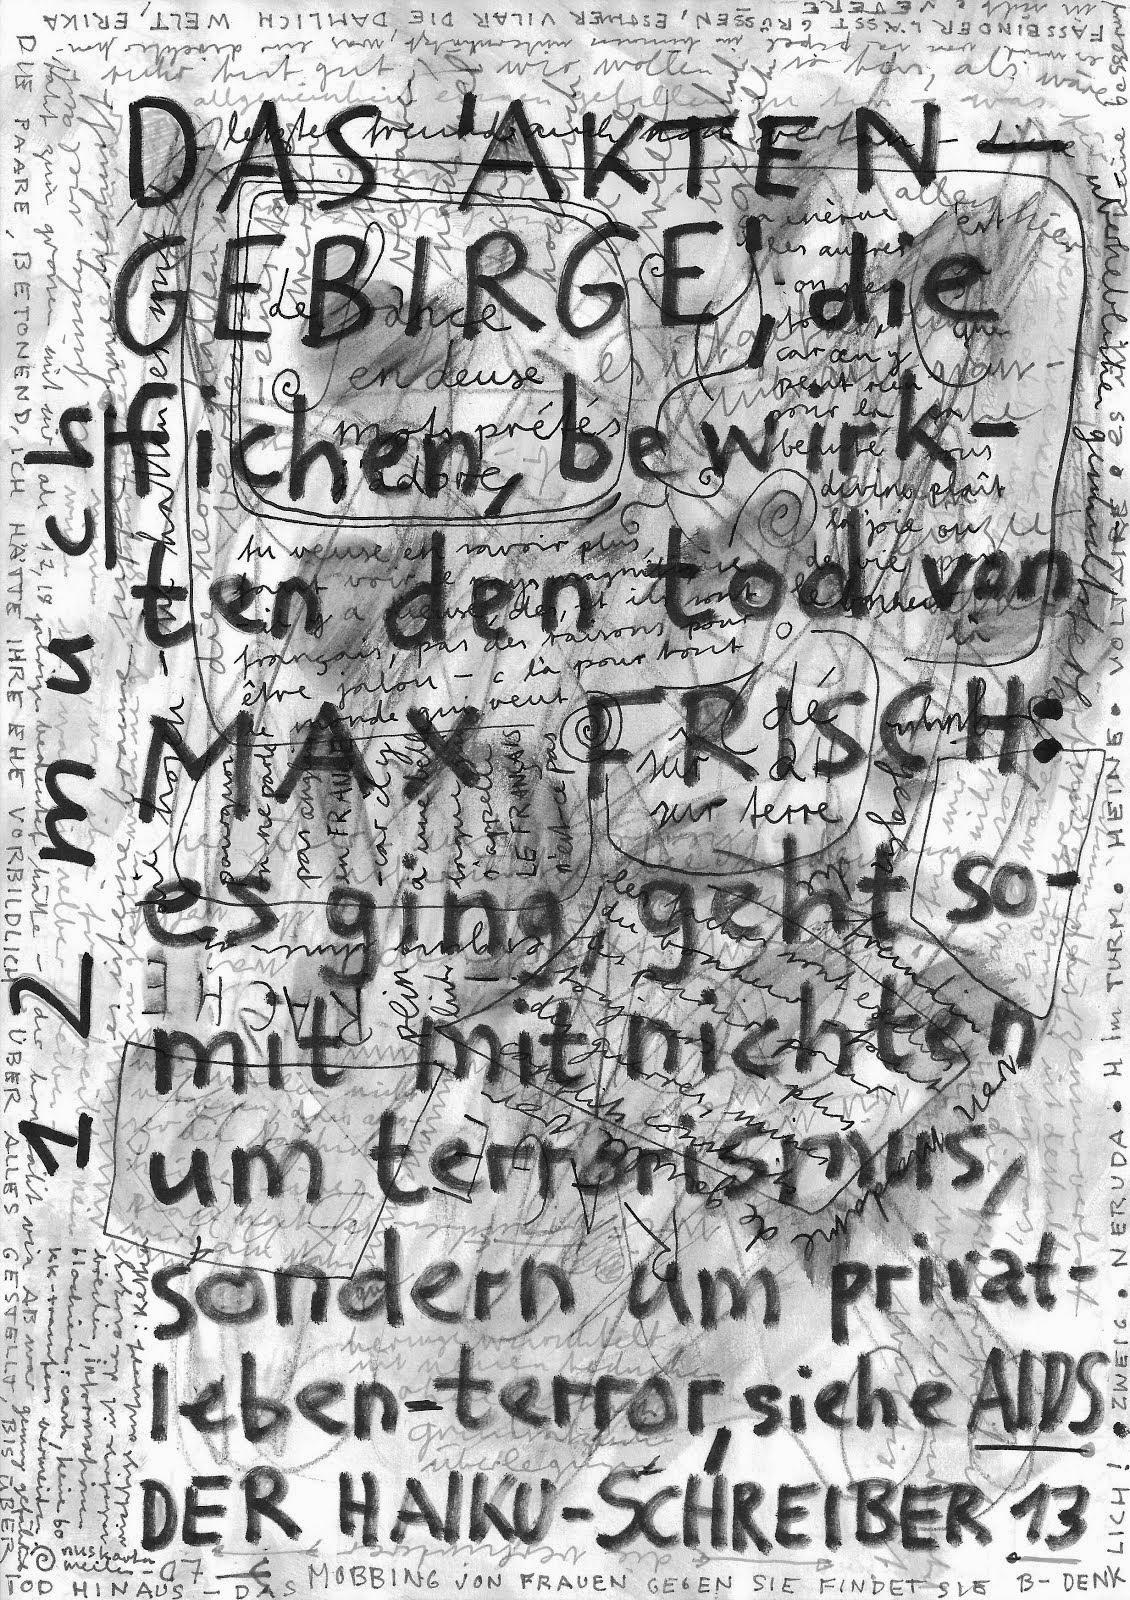 GK panthéON mischa vetere exil, max frisch - 2011ch i.m. lindtberg ssv freies wort at de